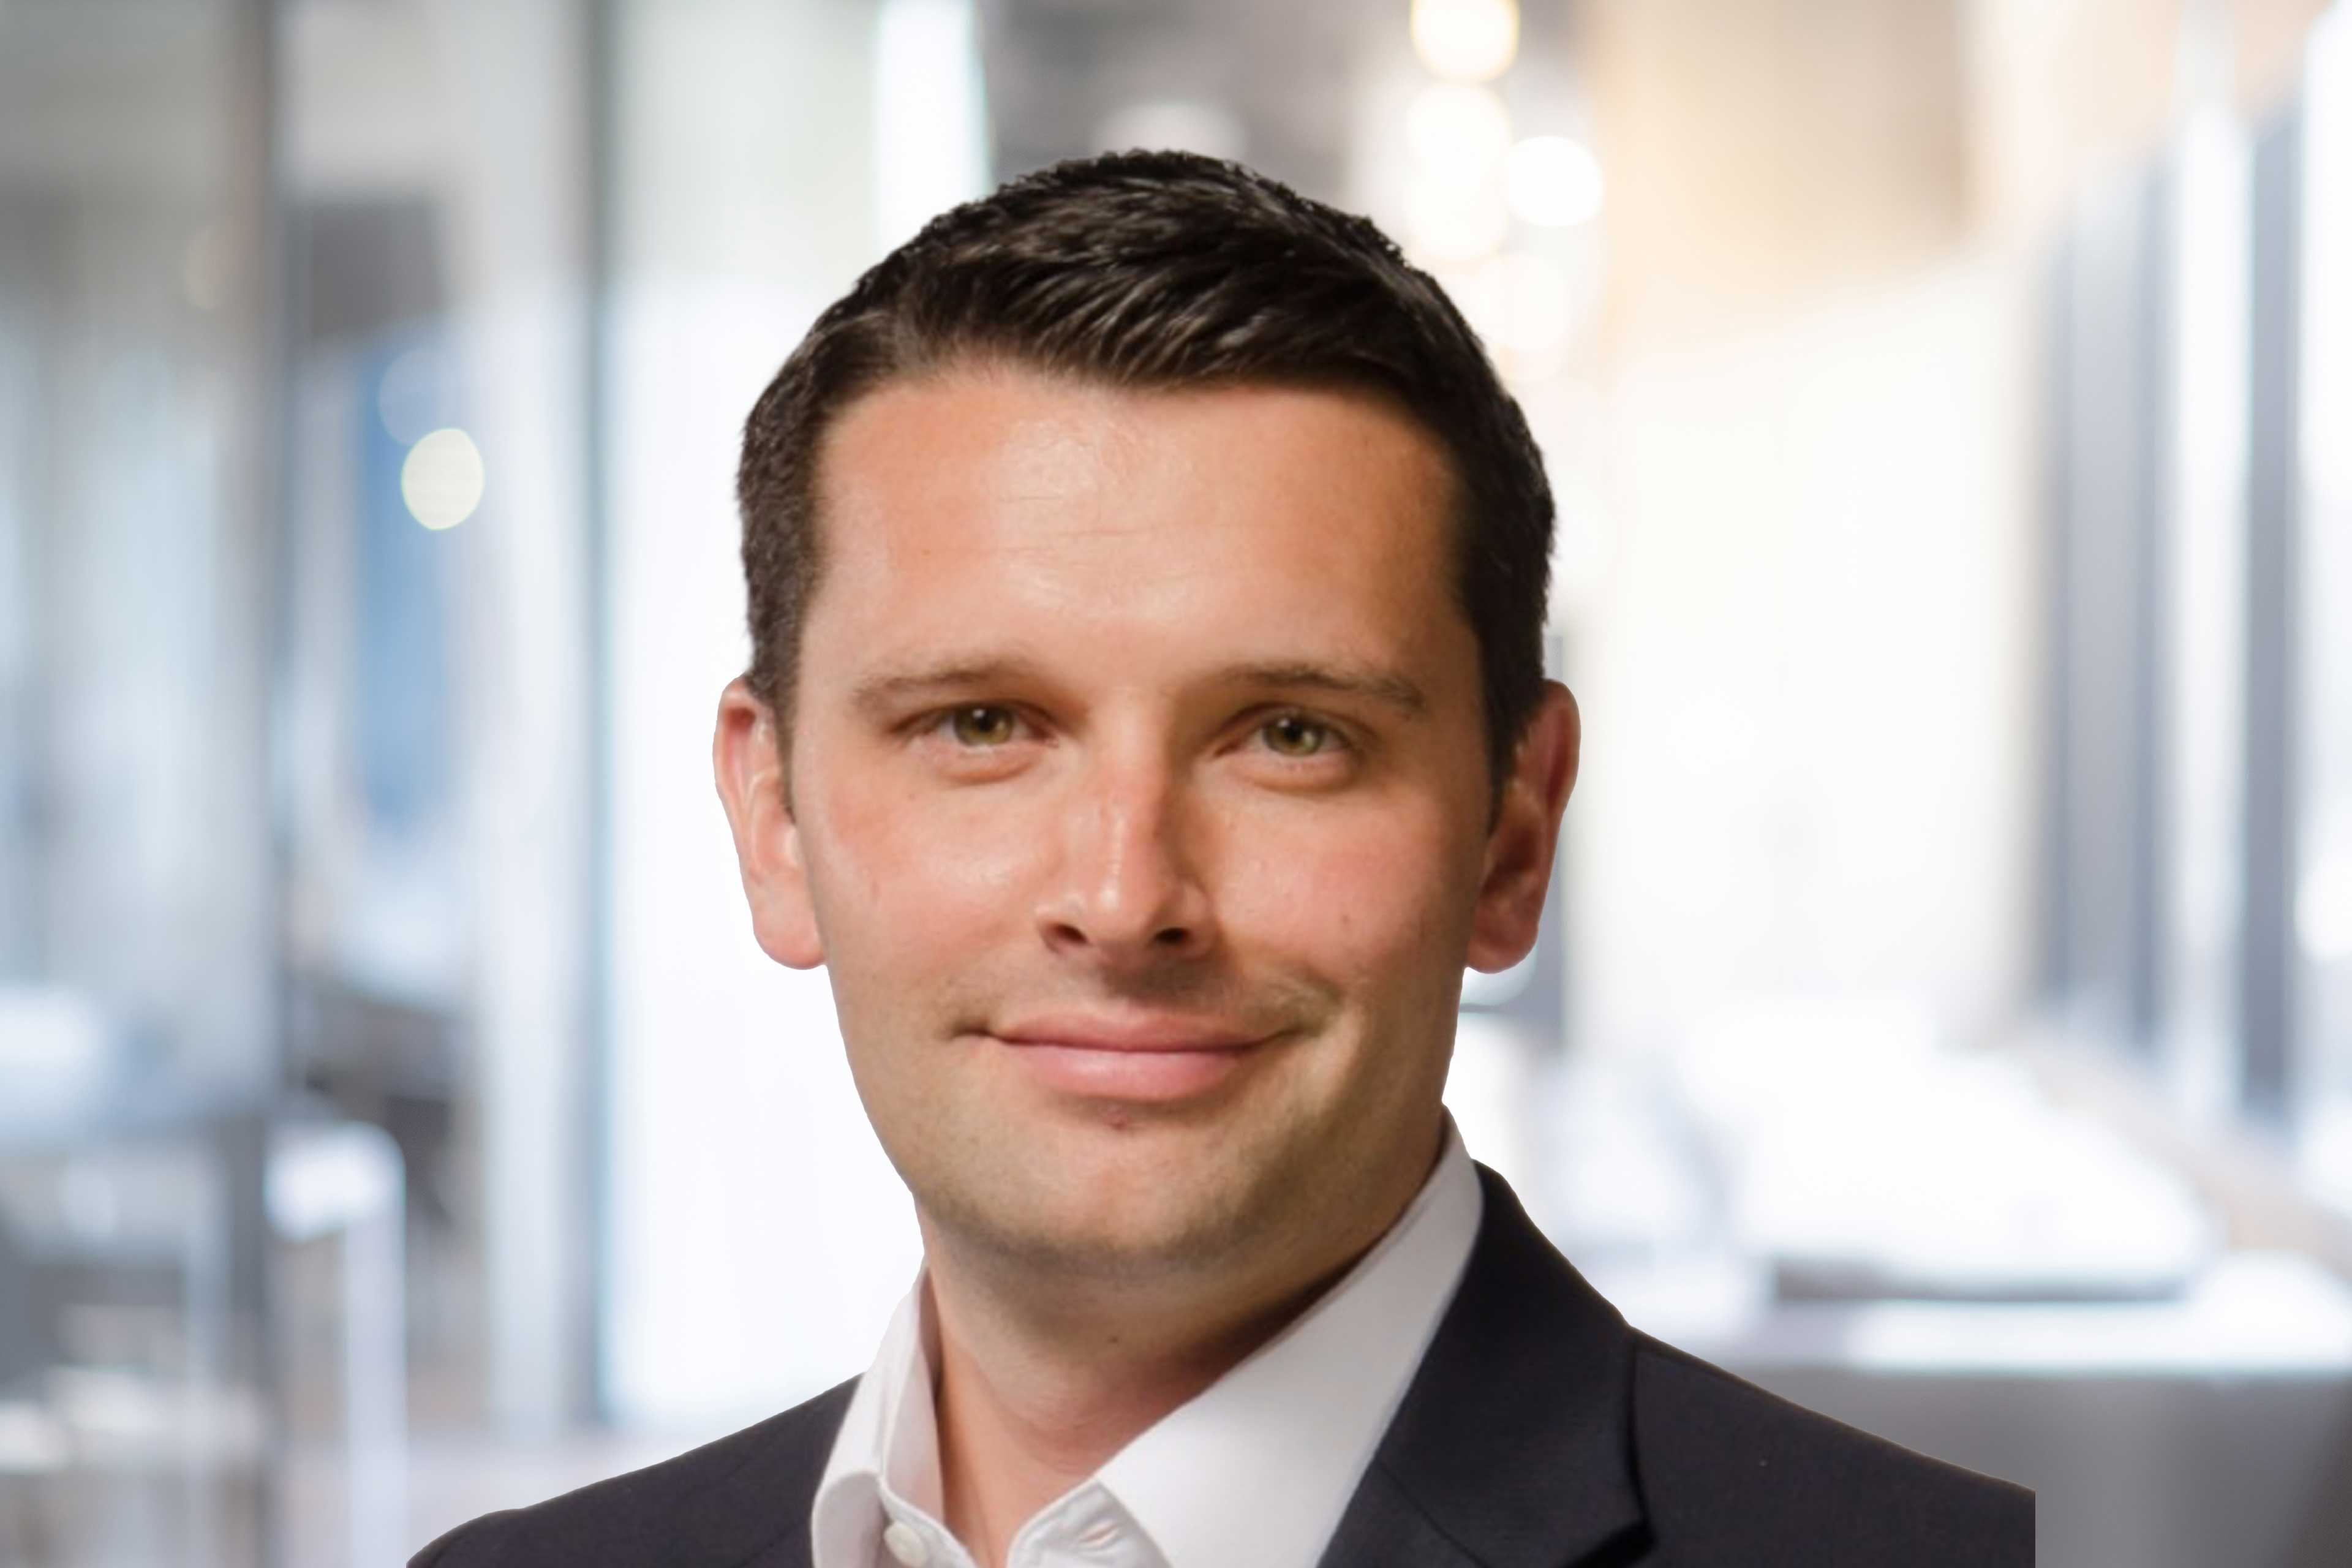 Derrick Porter, CEO, Beauty Industry Group